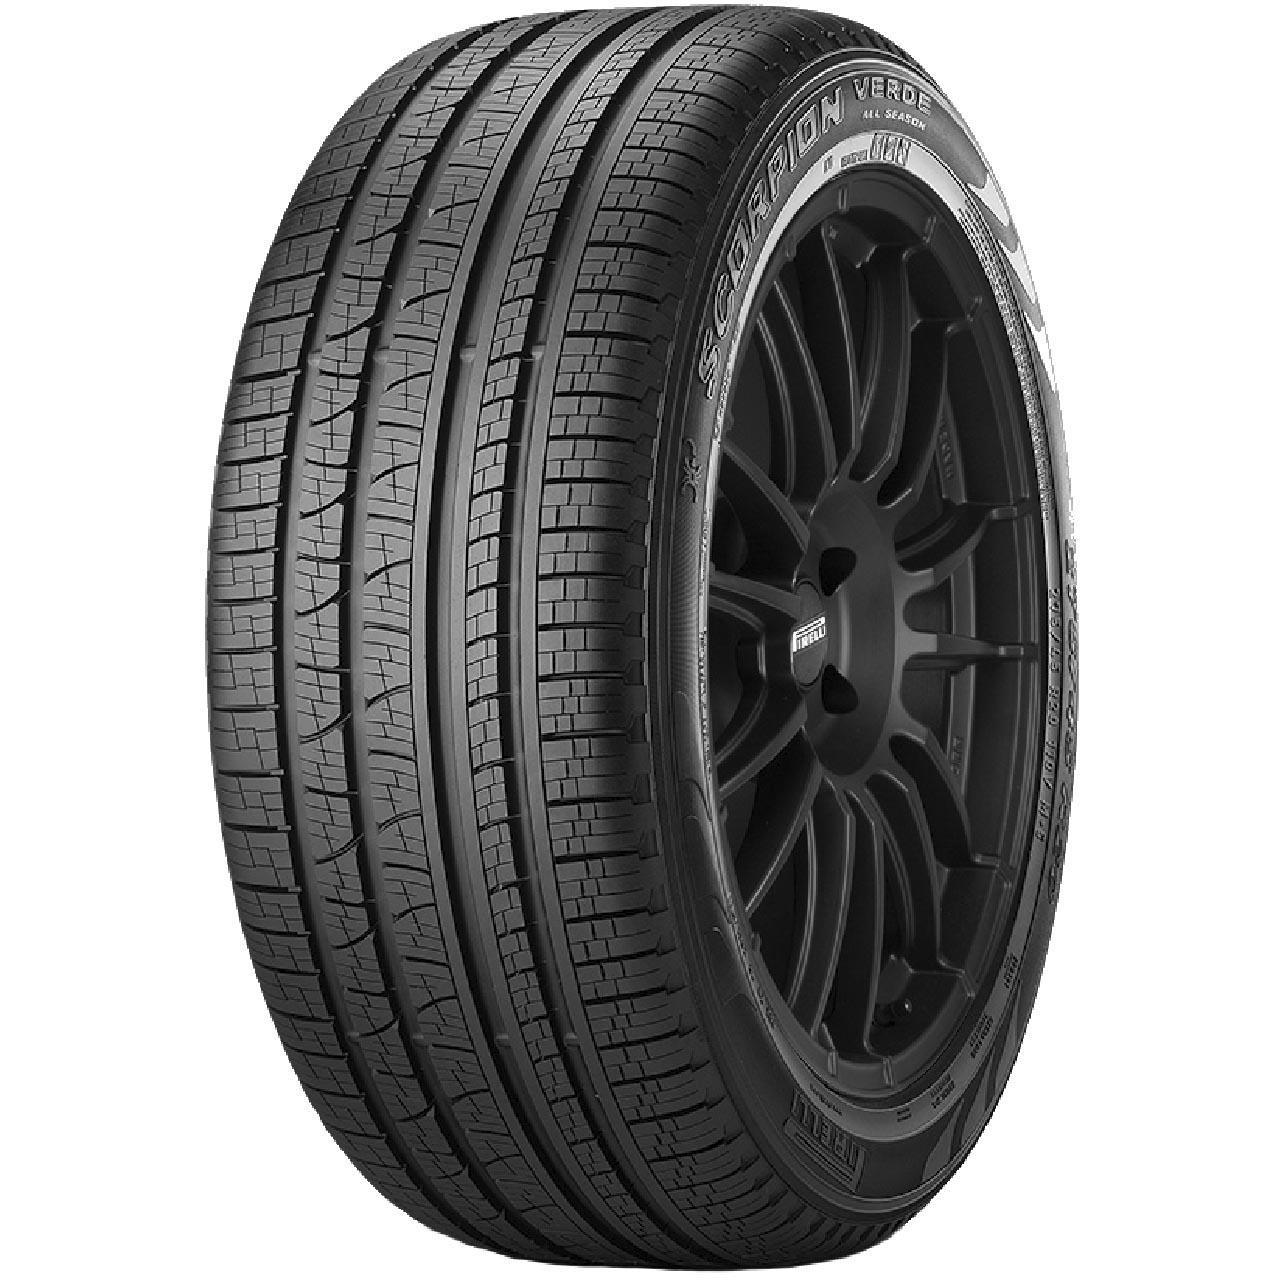 Pirelli Scorpion Verde AS 255/55R18 109H XL RFT *